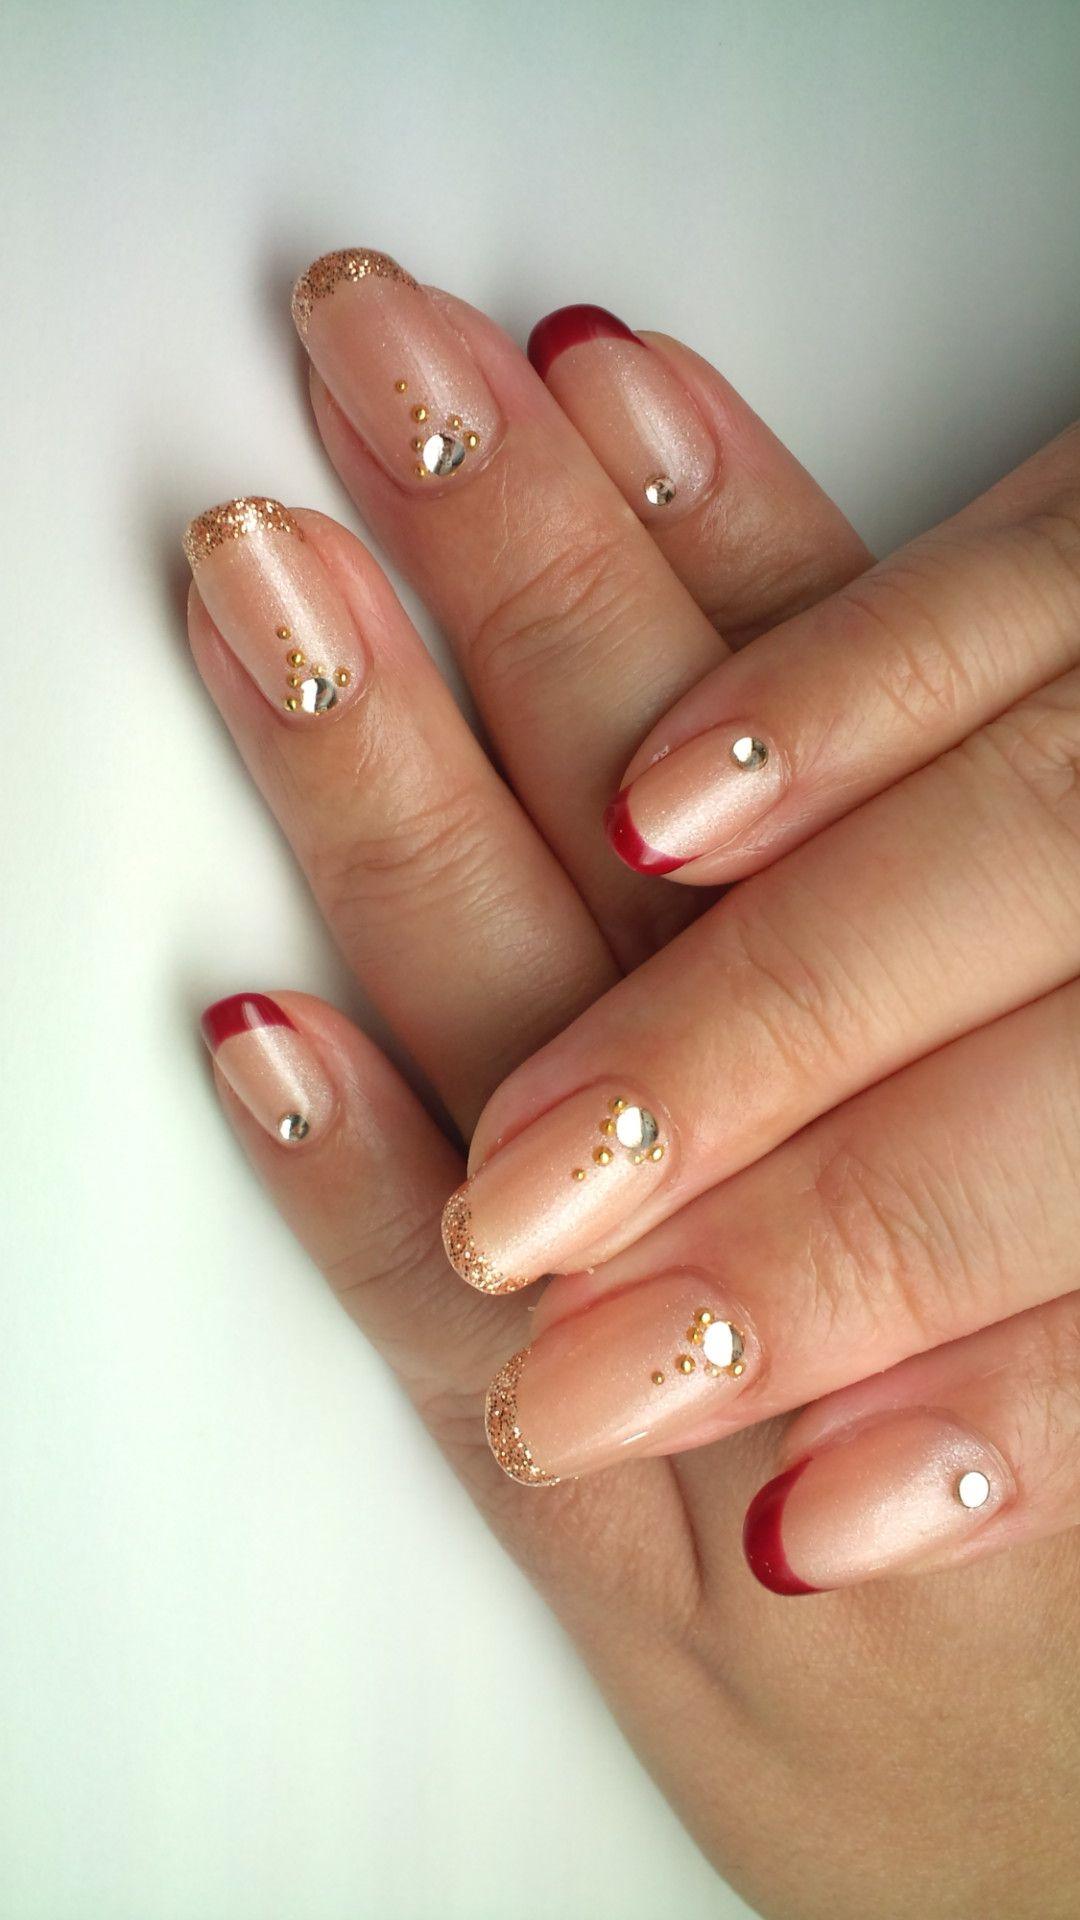 October nail - tast of Fall on oriental design. - October Nail - Tast Of Fall On Oriental Design. Nails Pinterest